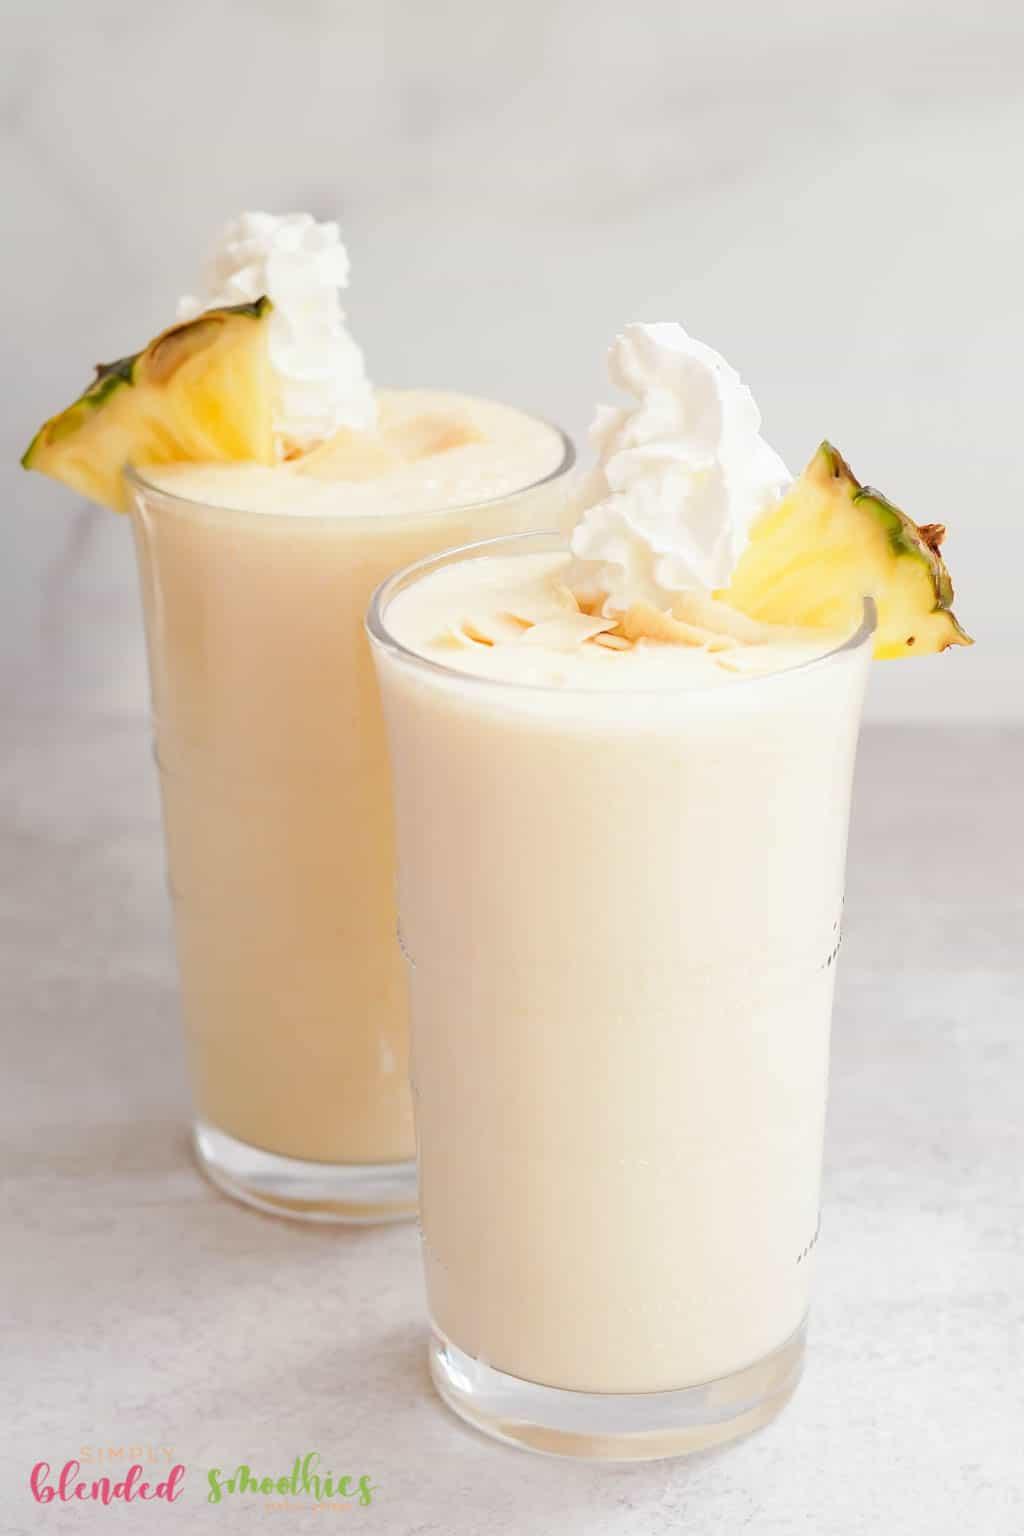 milkshake made with pineapple